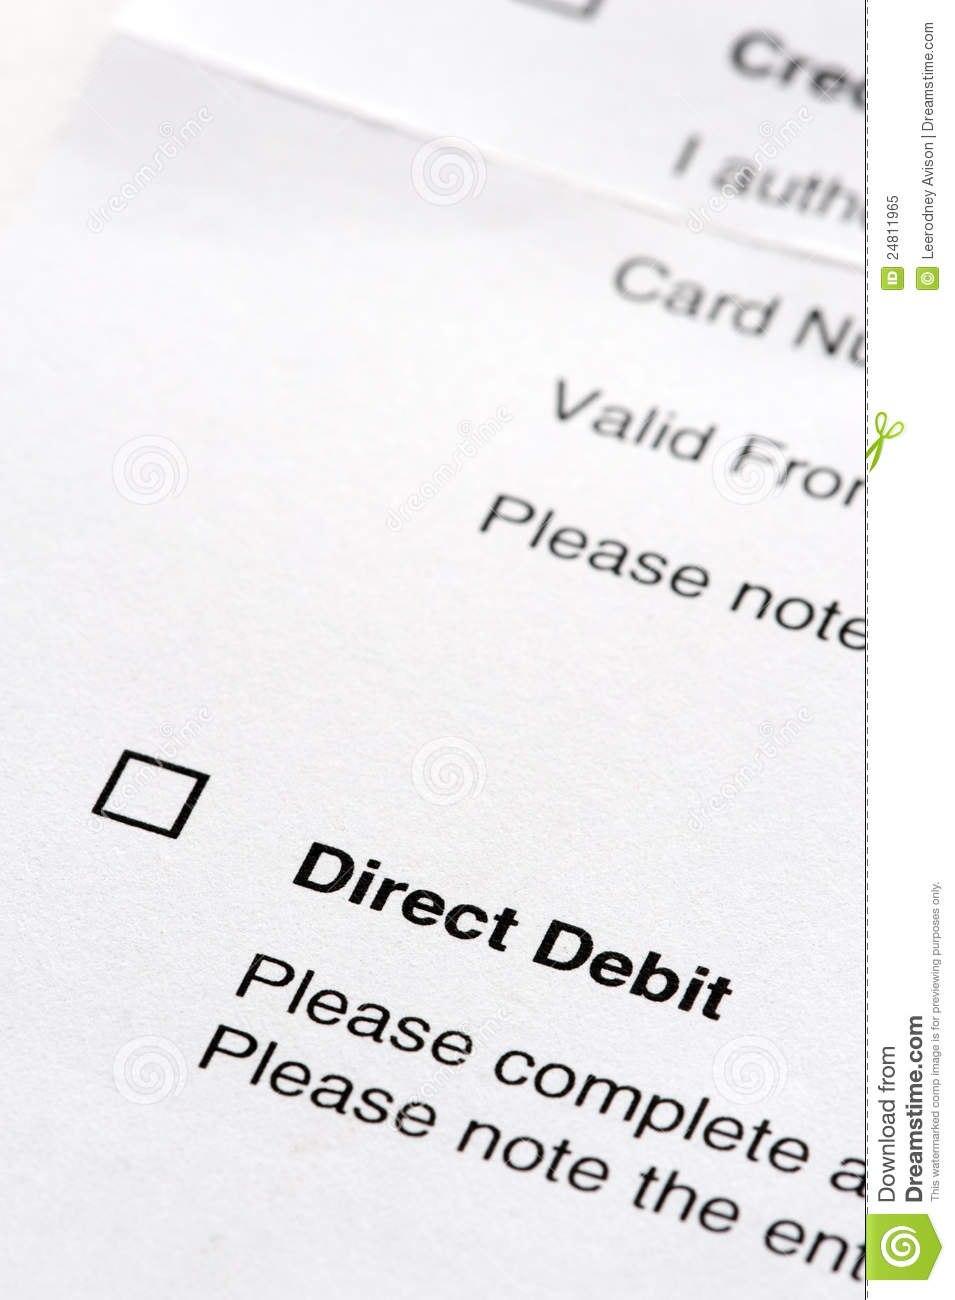 Direct Debit Agreement Form Stock Image  Image Of Note Agree Inside Direct Debit Agreement Template